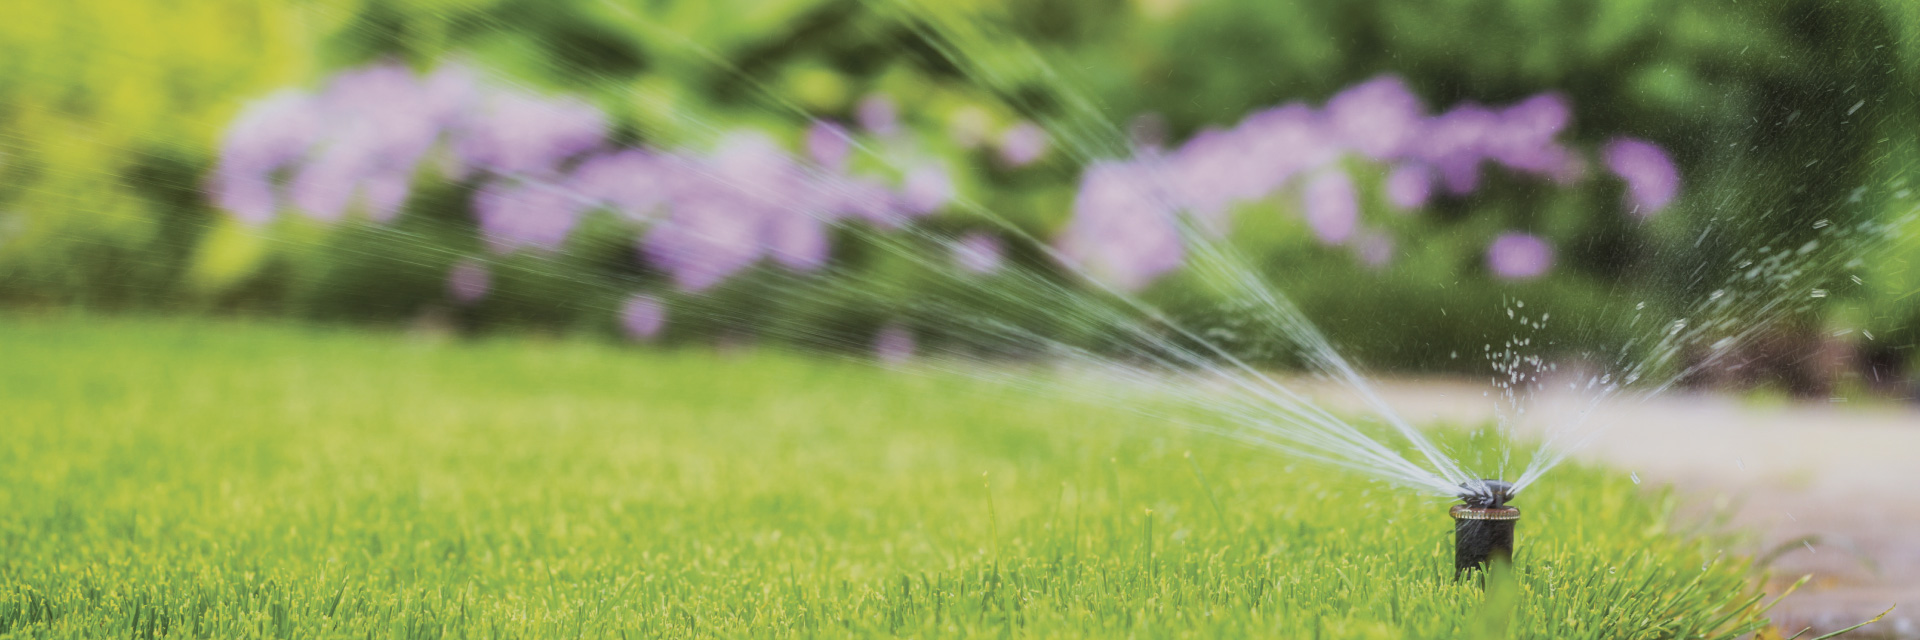 SLIDER_irrigation-02